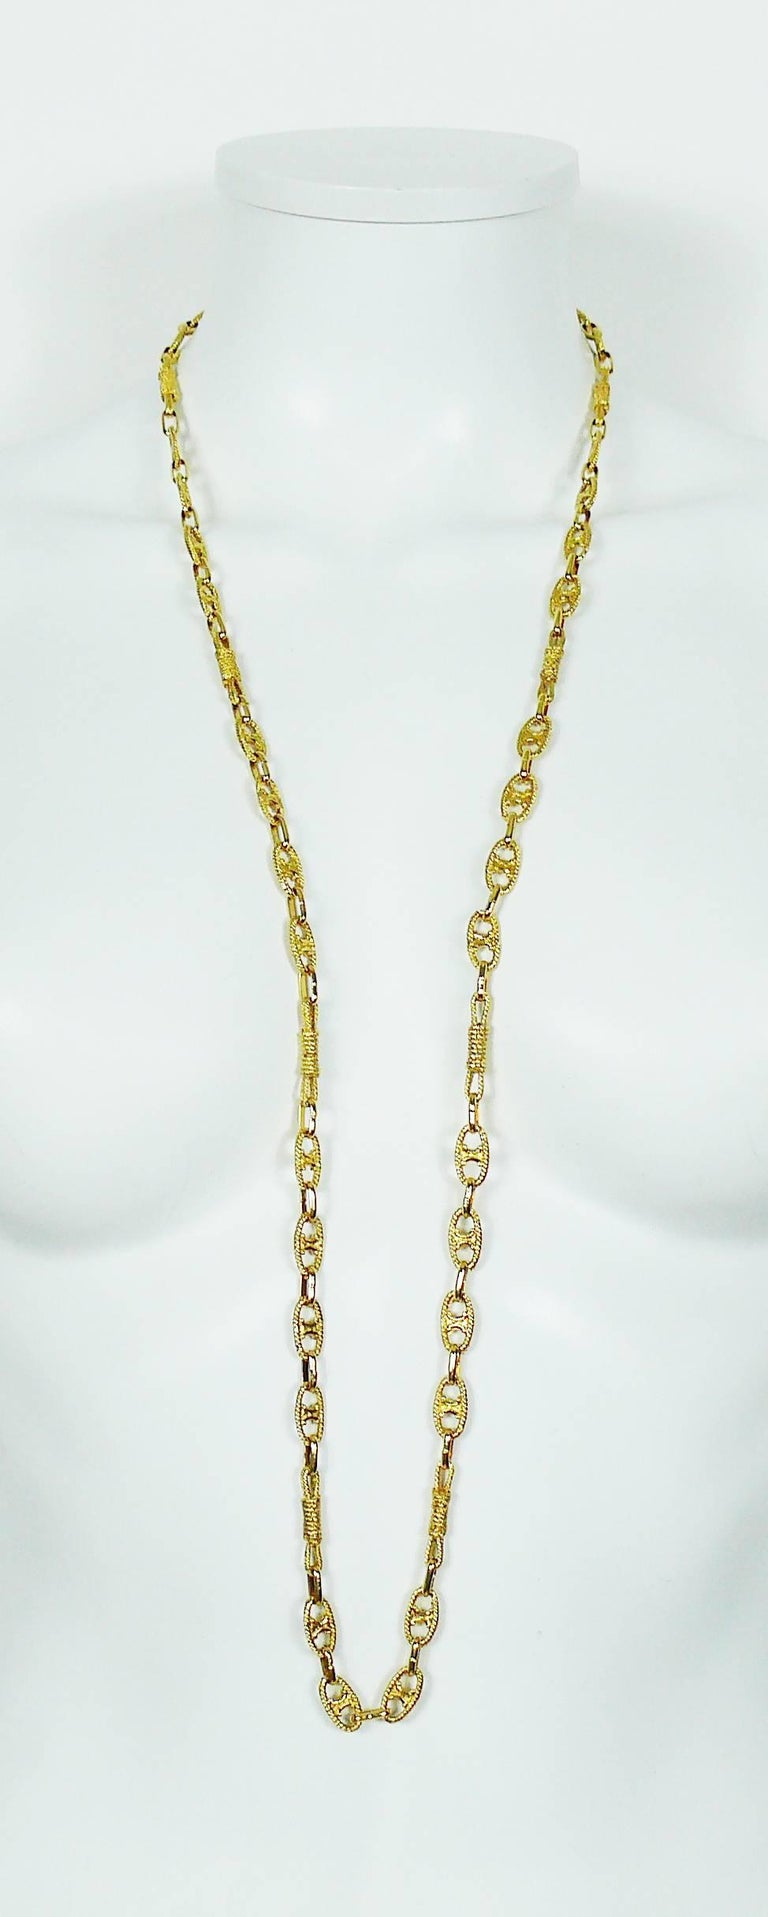 French Designer Celine's Jewelry For Valentine's Day